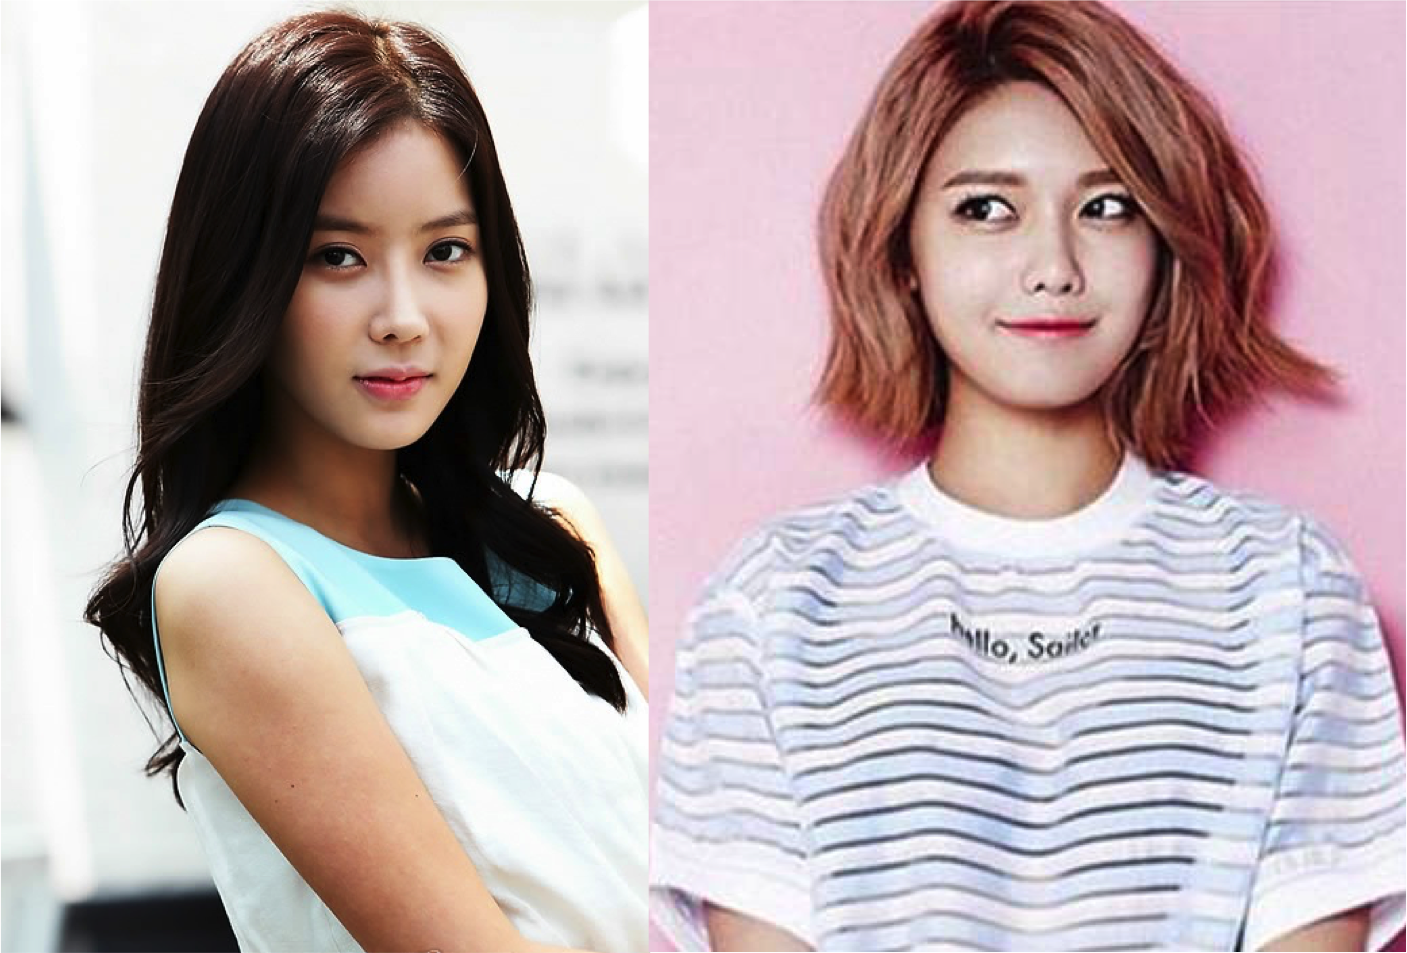 Lee ji hoon and song hyo dating 10